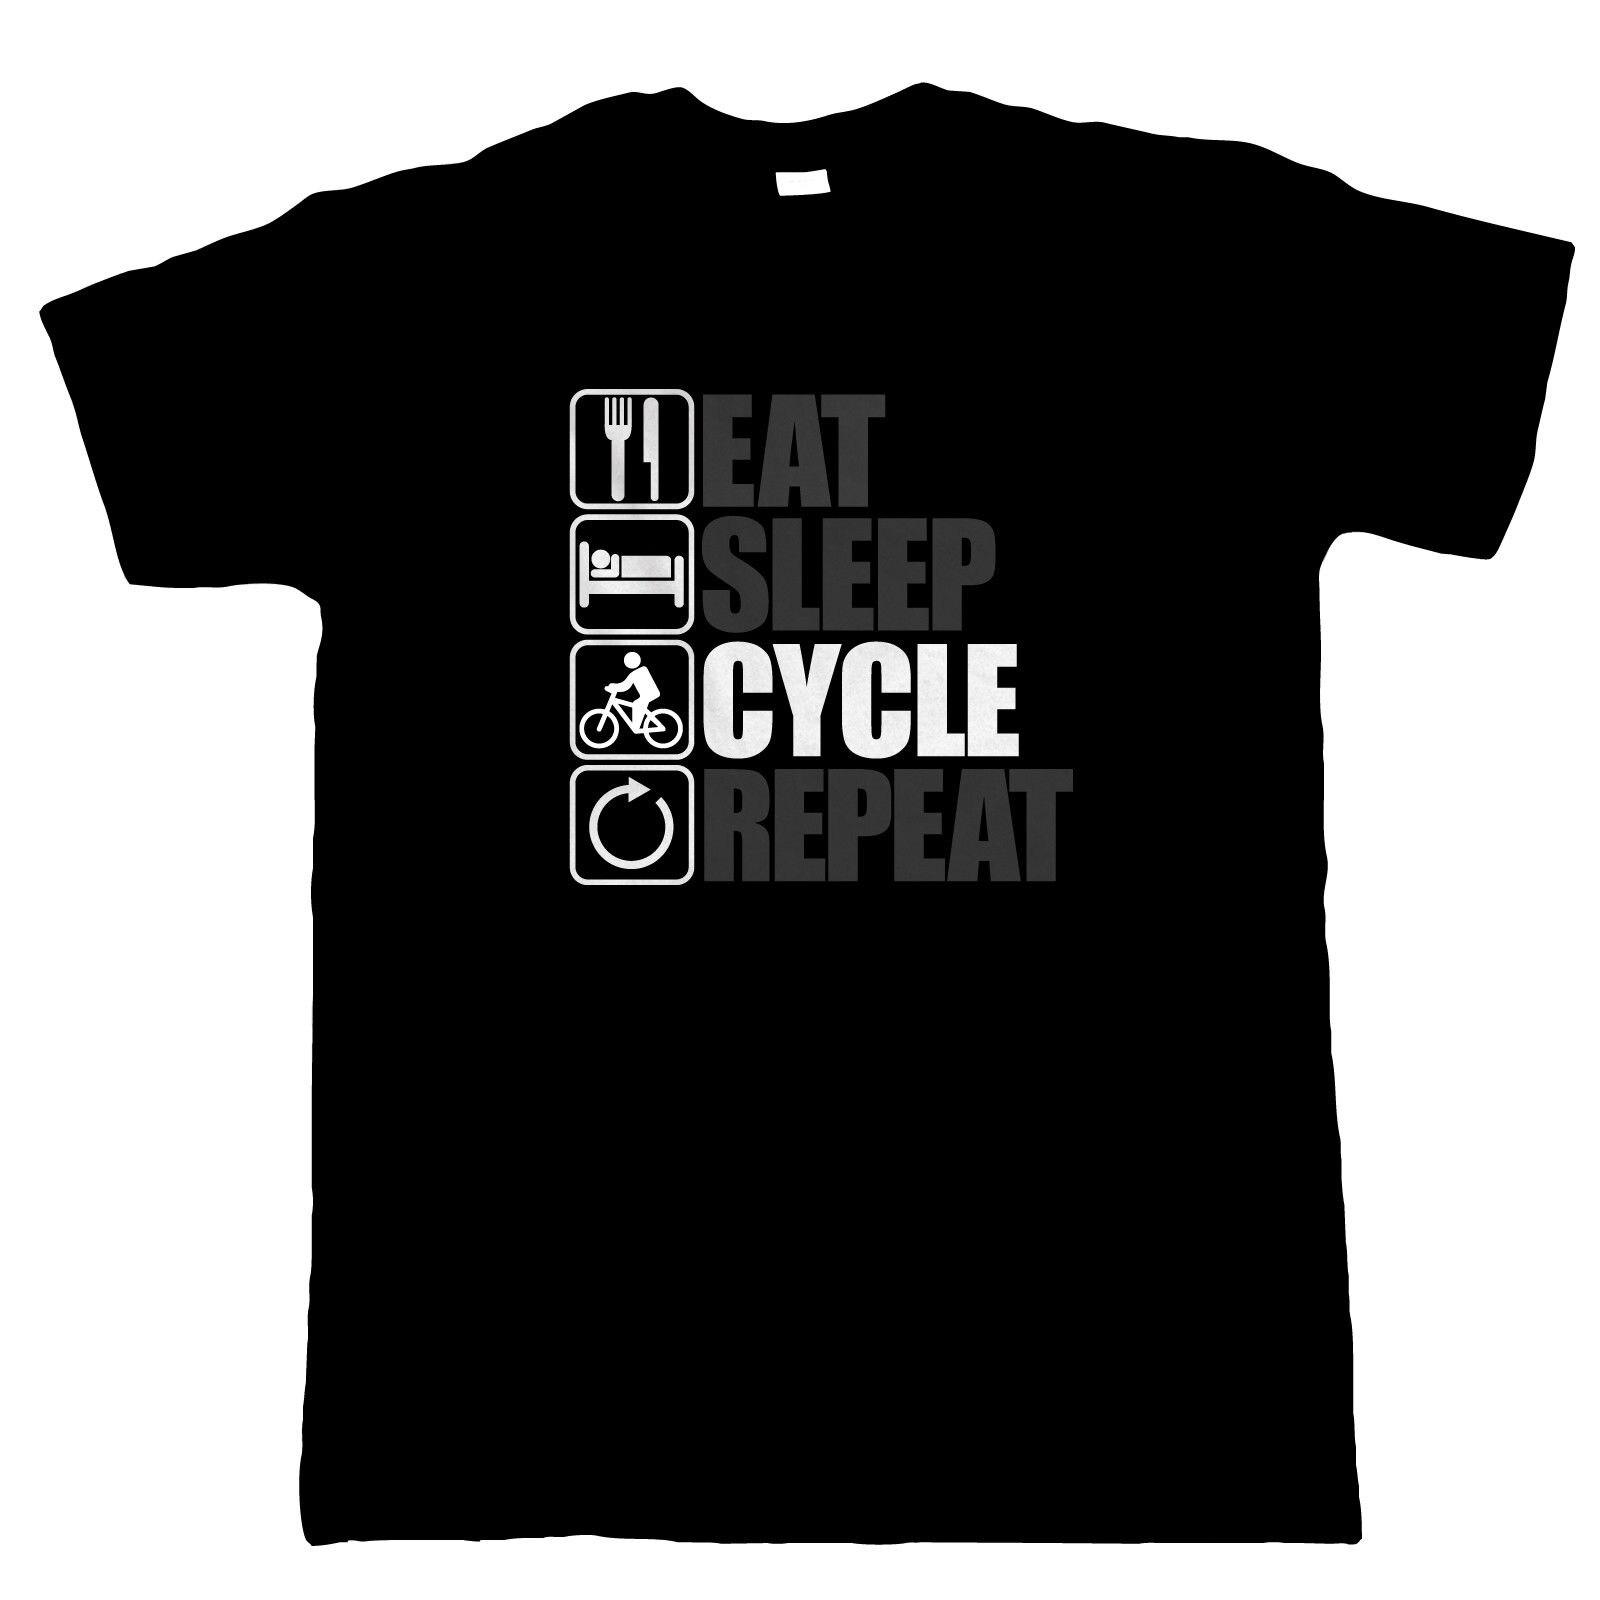 Eat Sleep Cycle Repeat, Mens T Shirt, Gift Dad Christmas, Gift Dad